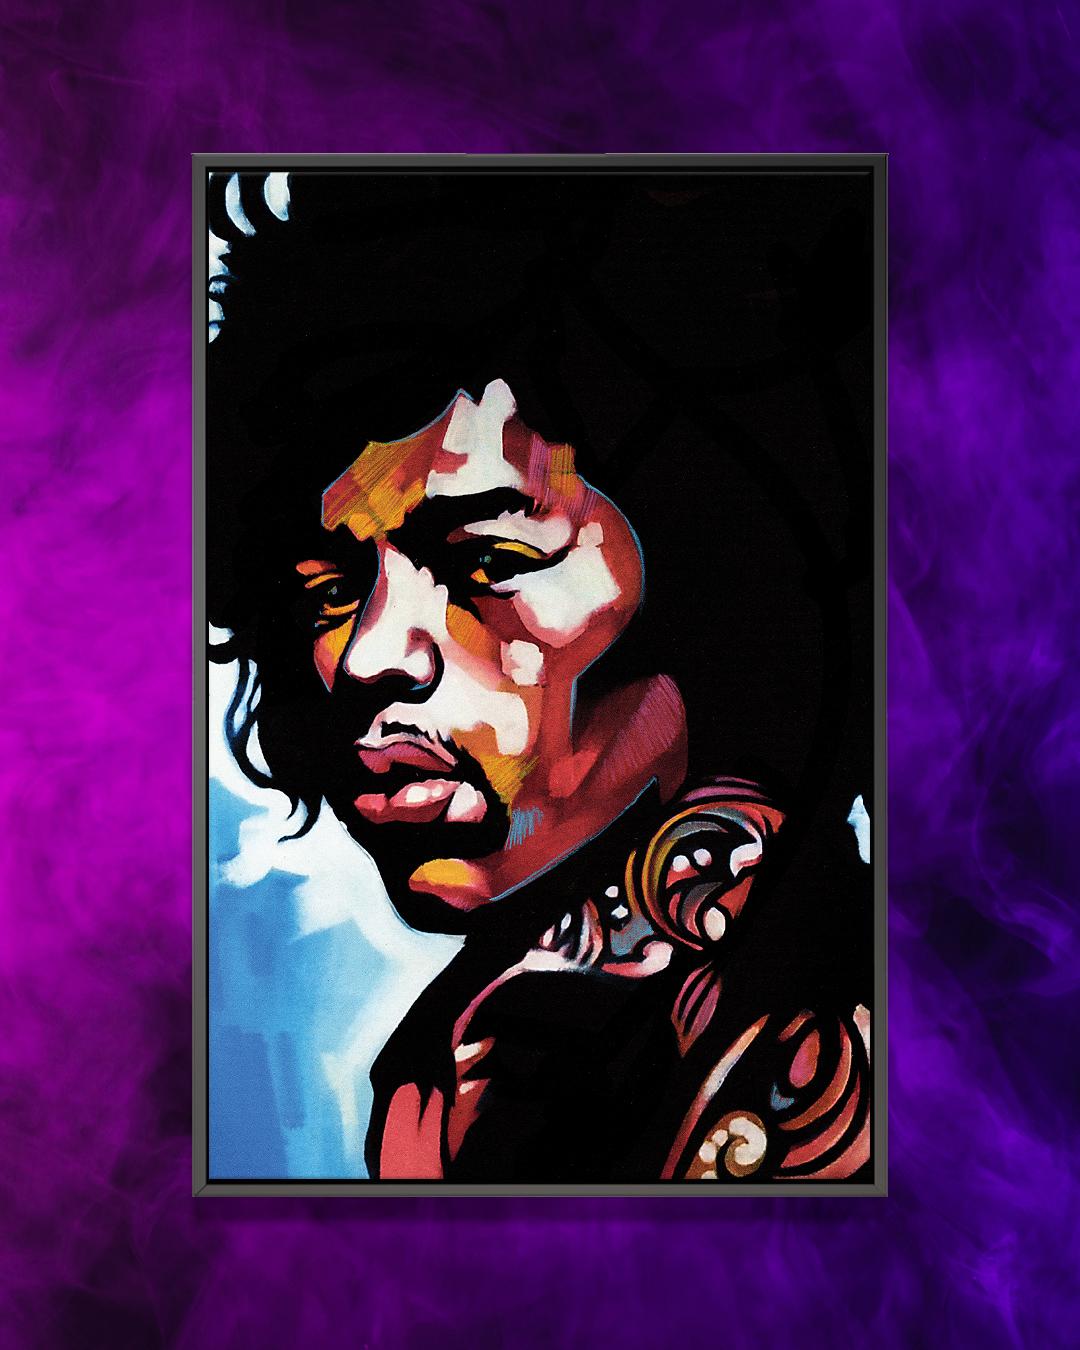 """Jimmi"" by Fernan Mora shows a multicolored portrait of Jimi Hendrix."